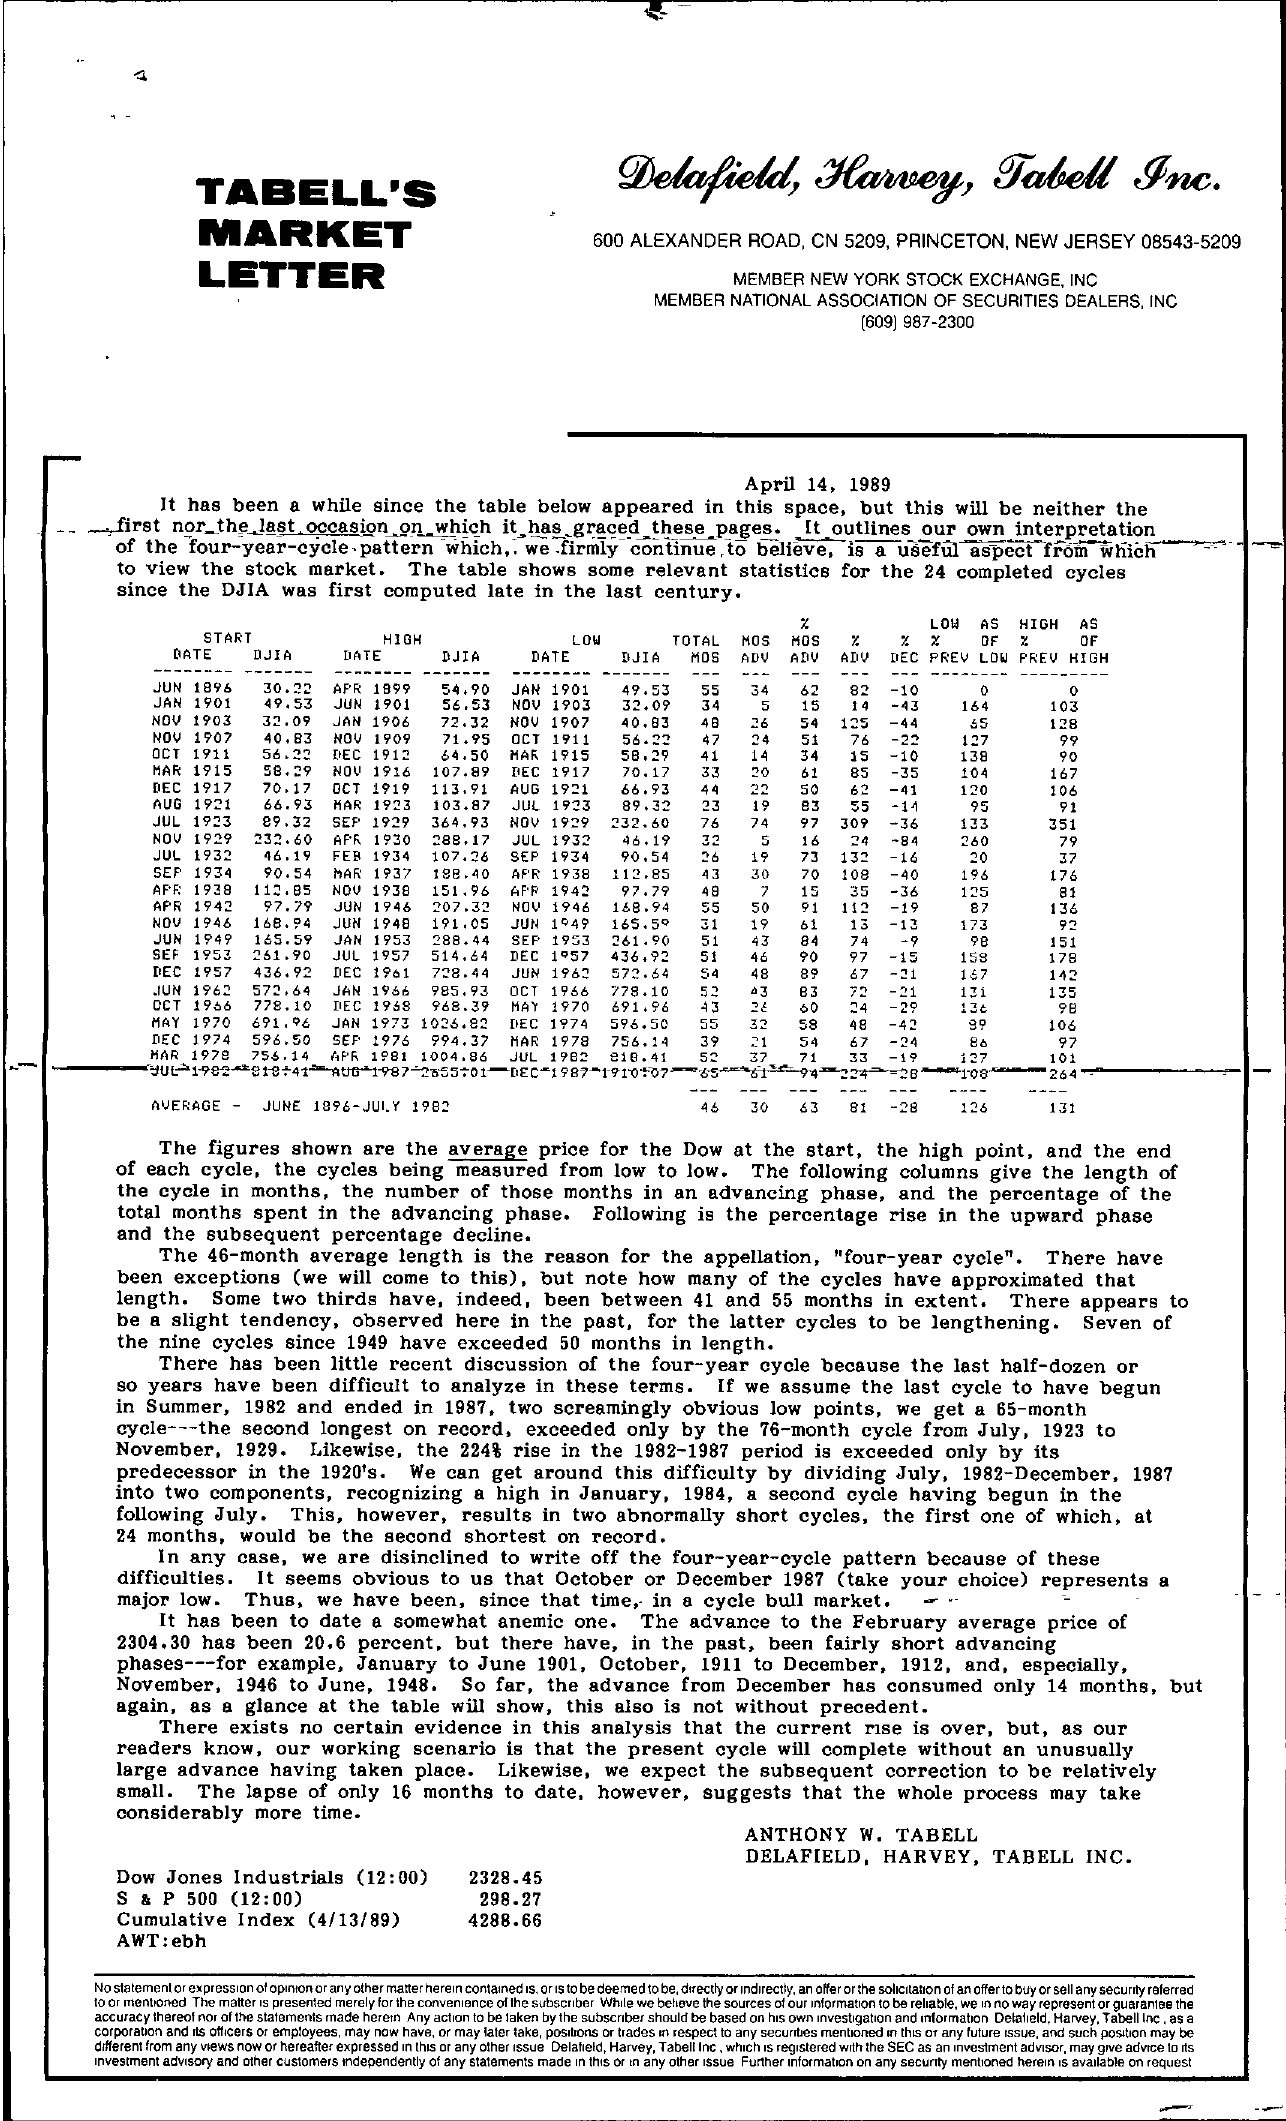 Tabell's Market Letter - April 14, 1989